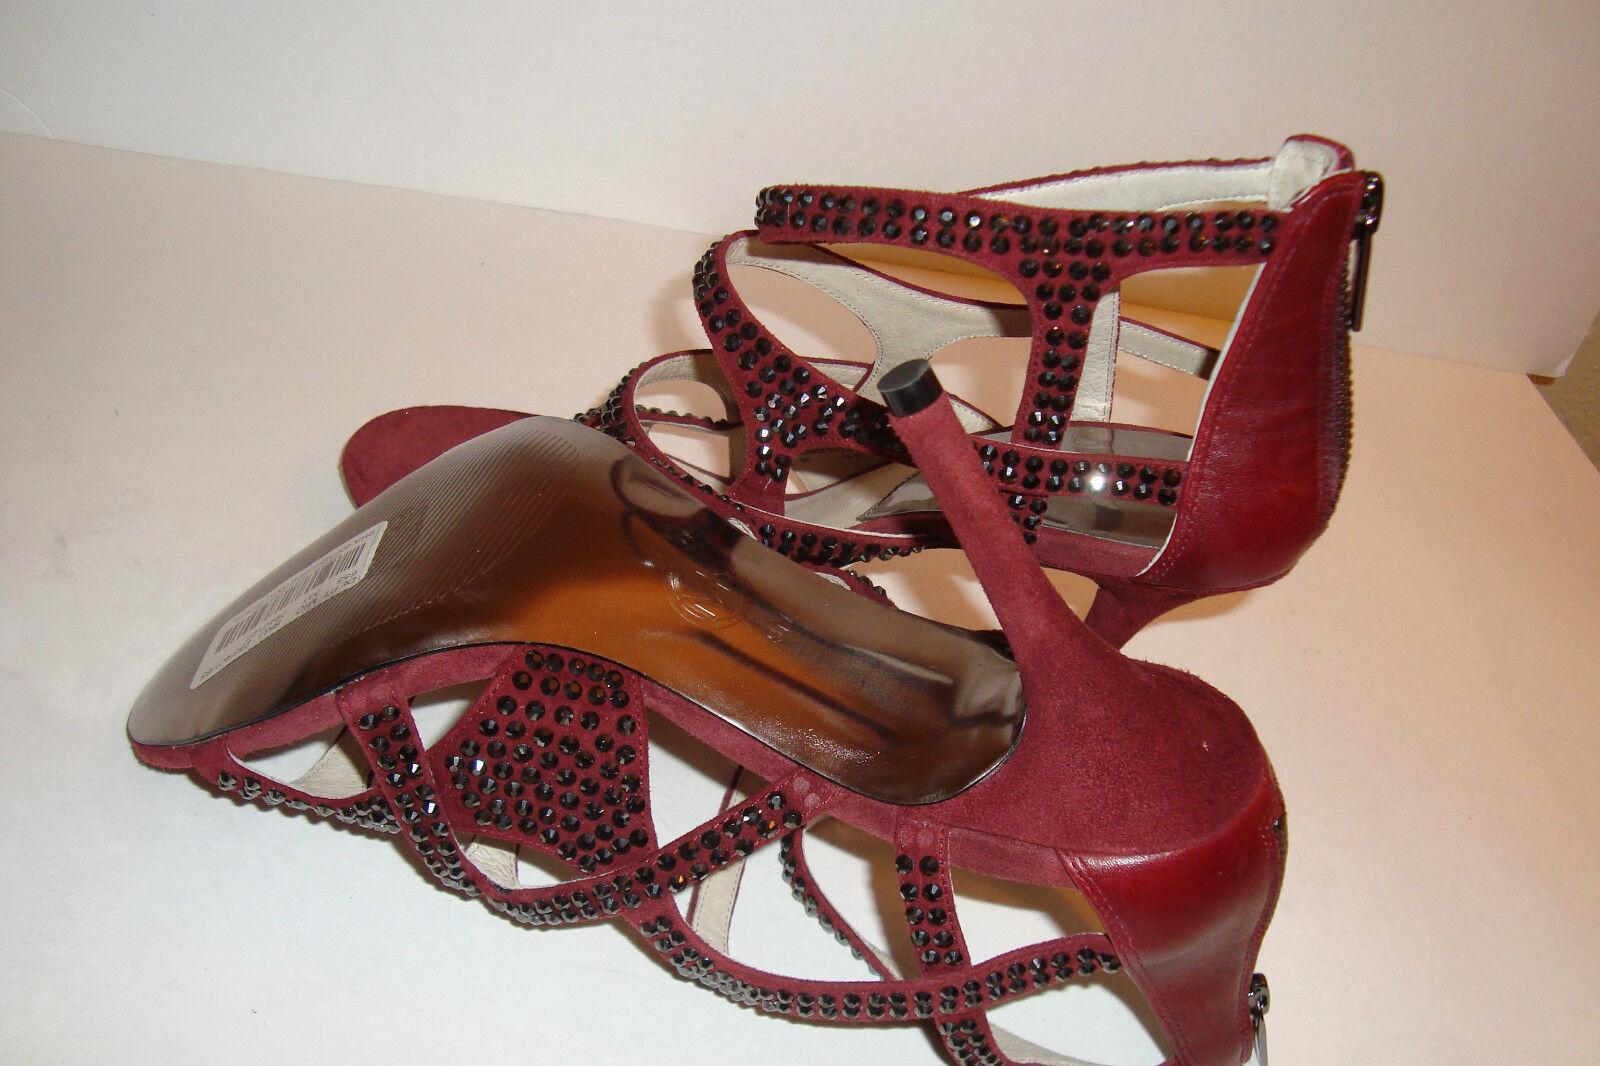 Michael Kors Damenschuhe Damenschuhe Damenschuhe NWOB AA13F Maddie Jeweled T Strap Sandales Schuhes 9 MED NEW eddb71